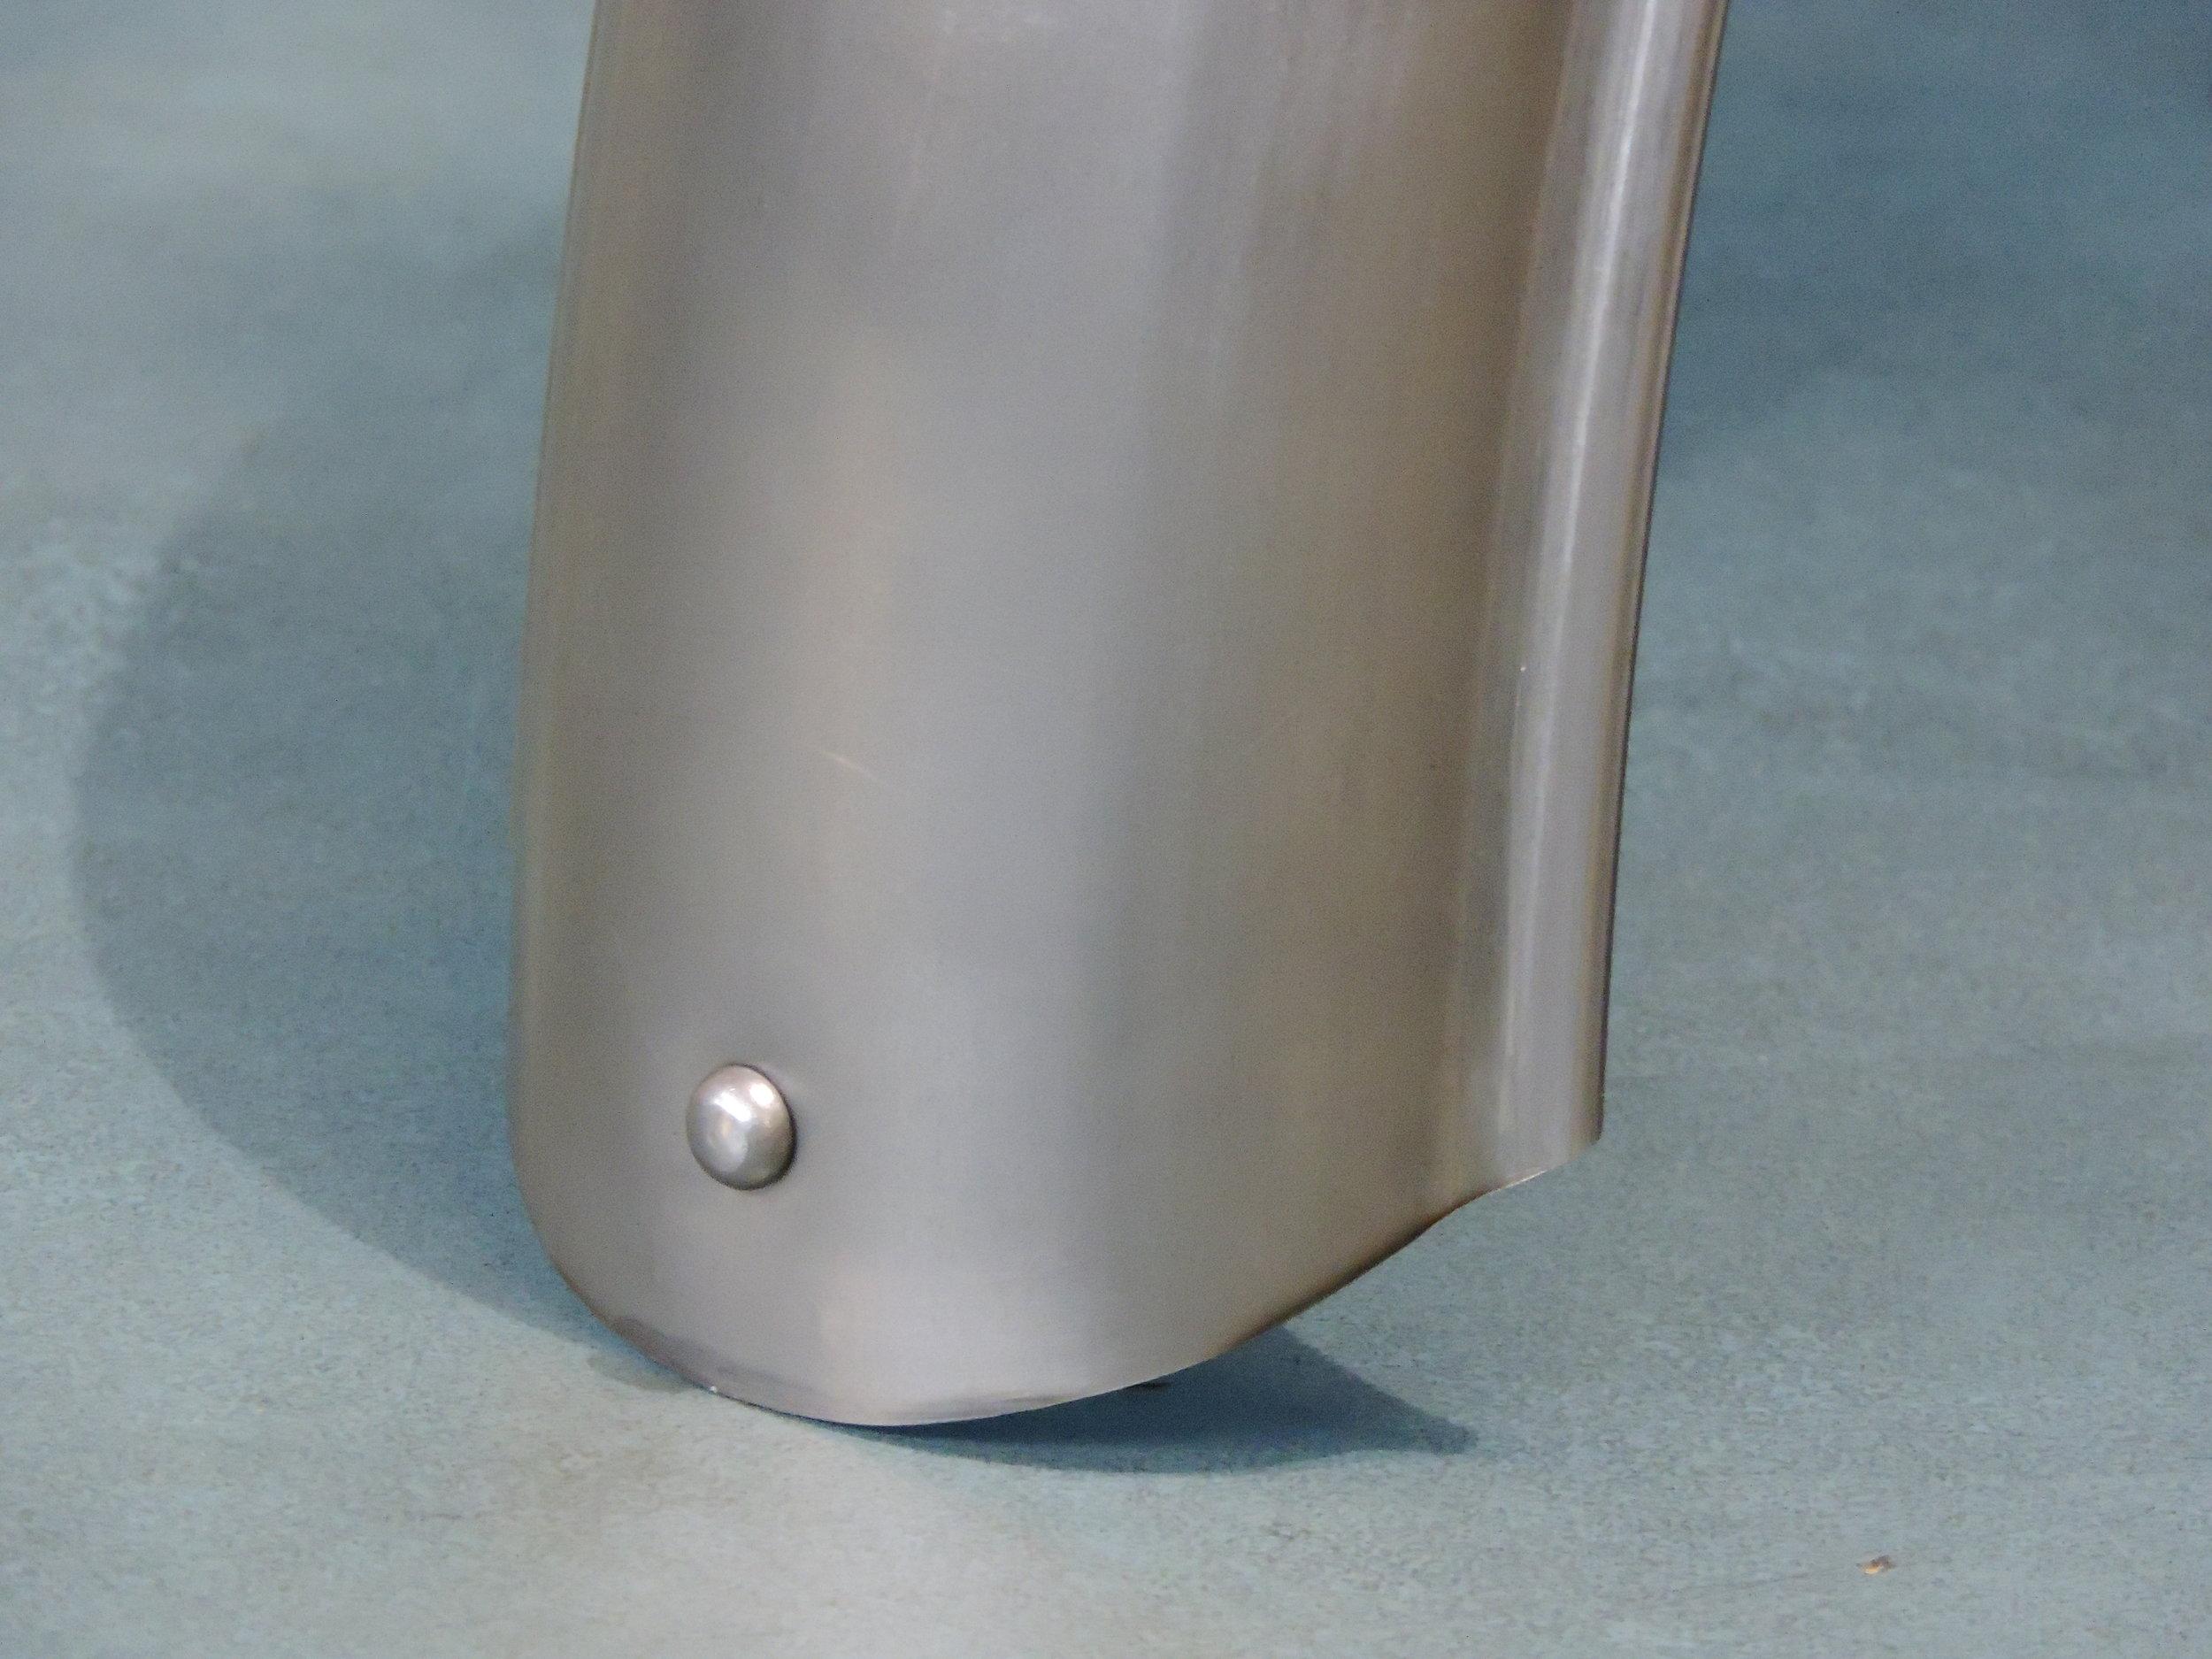 08NORRF-2 M18 1923 (15).JPG